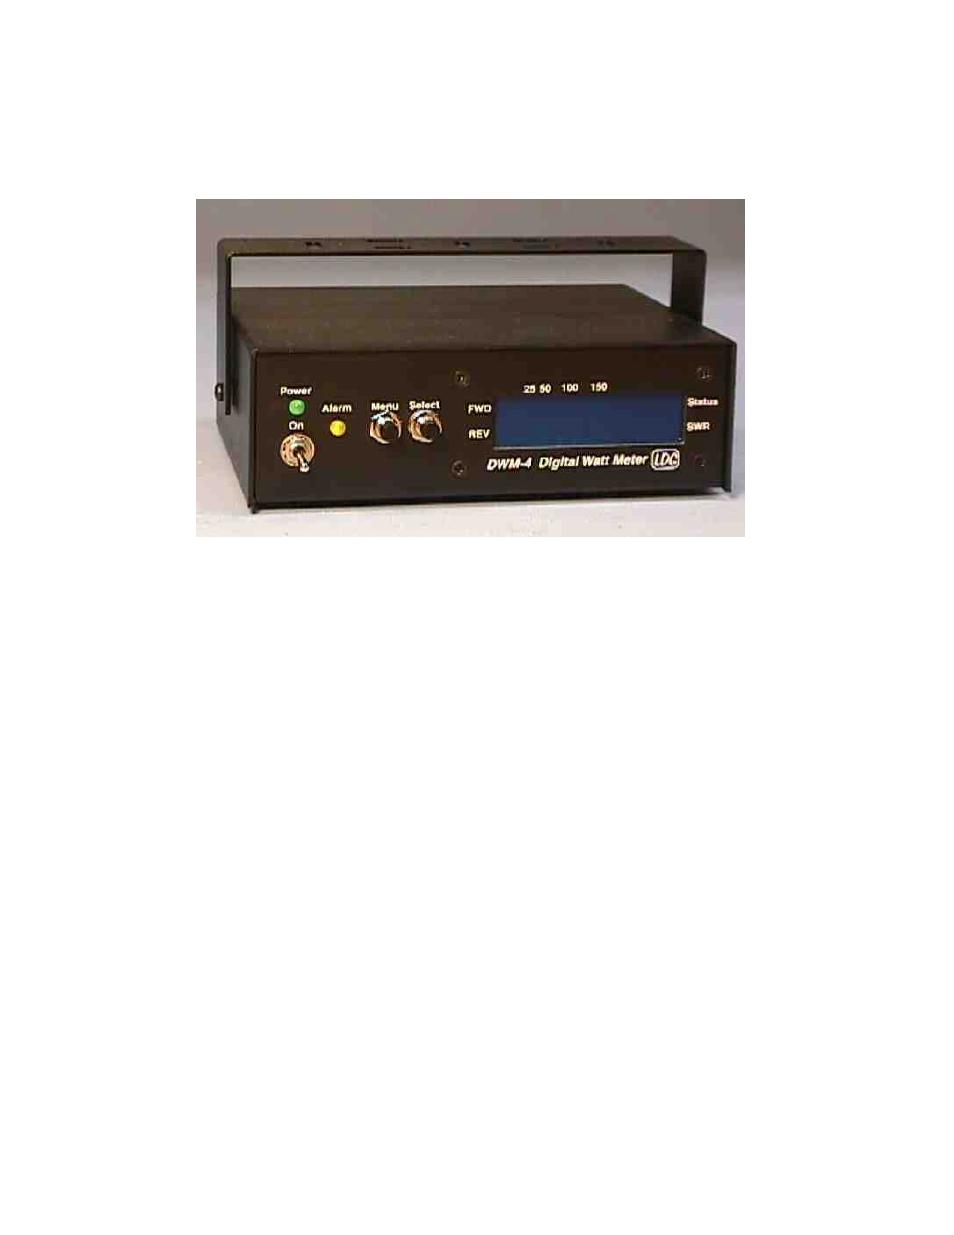 Macsense Connectivity Digital Wattmeter DWM-4 User Manual